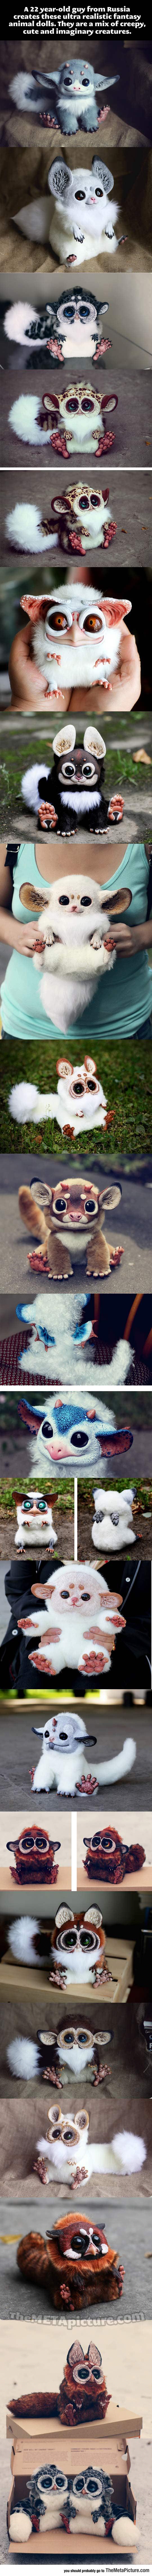 realistic-creatures-fantasy-dolls-Russia